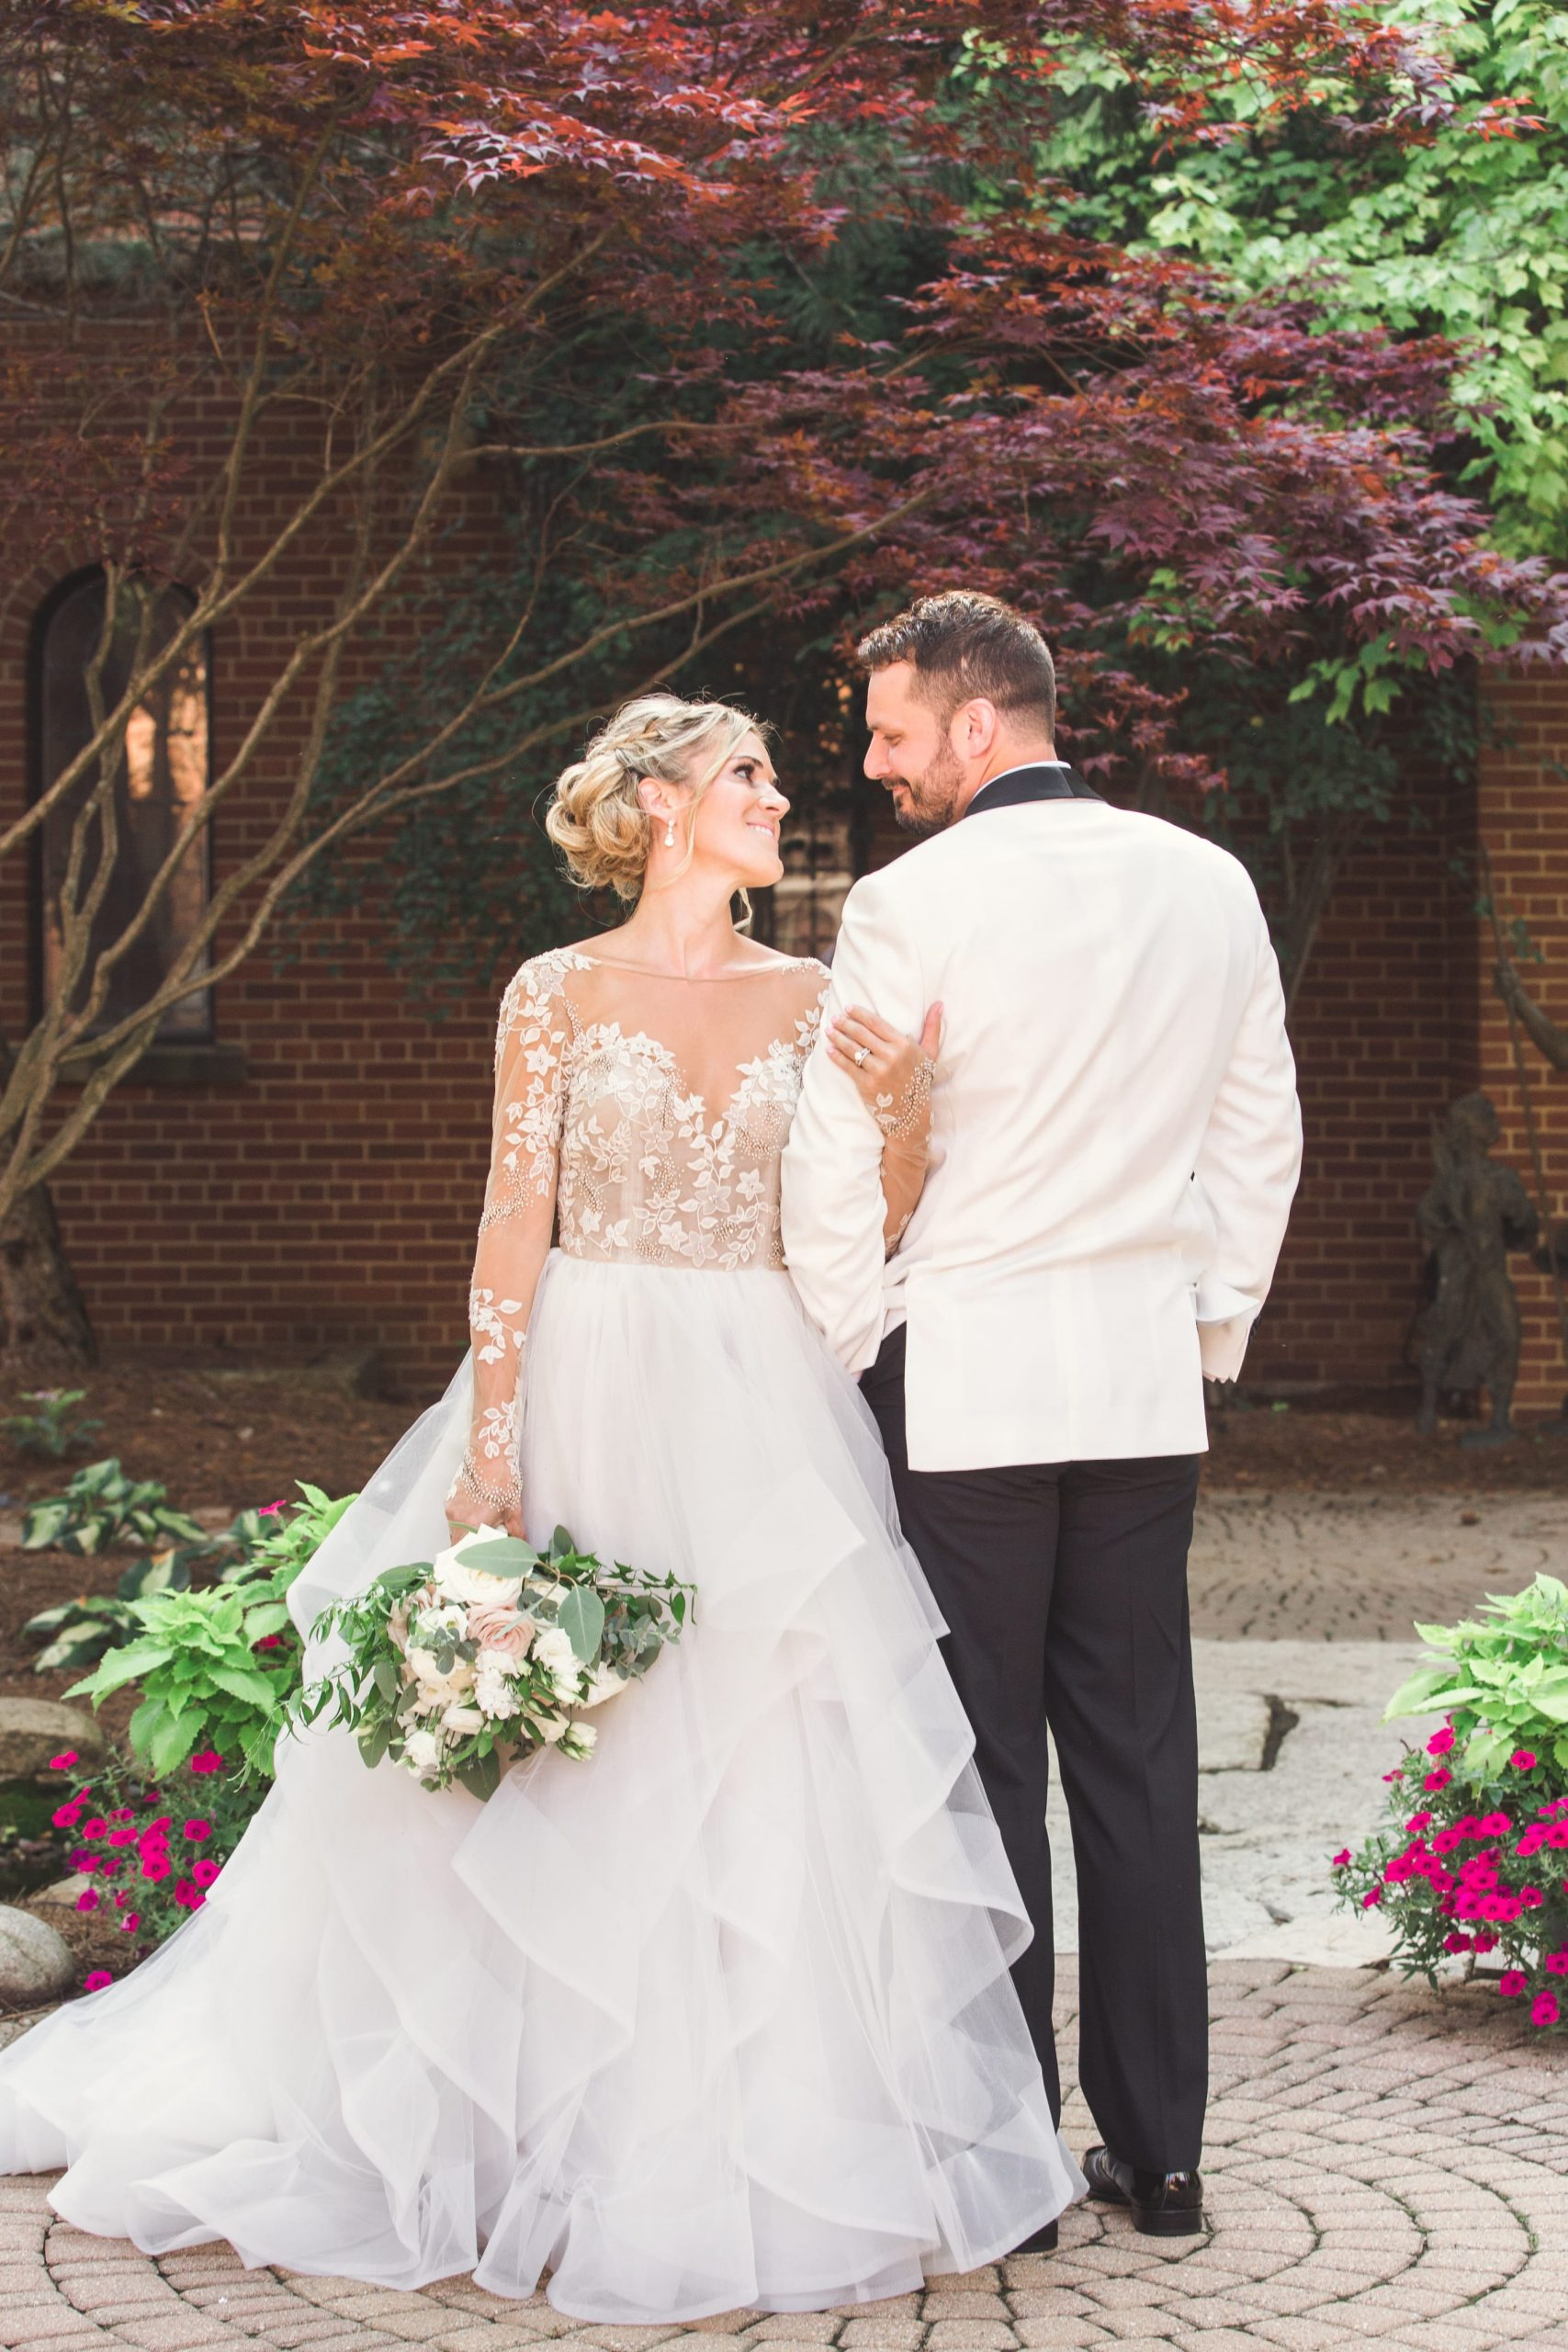 bride and grooms arms interlocked